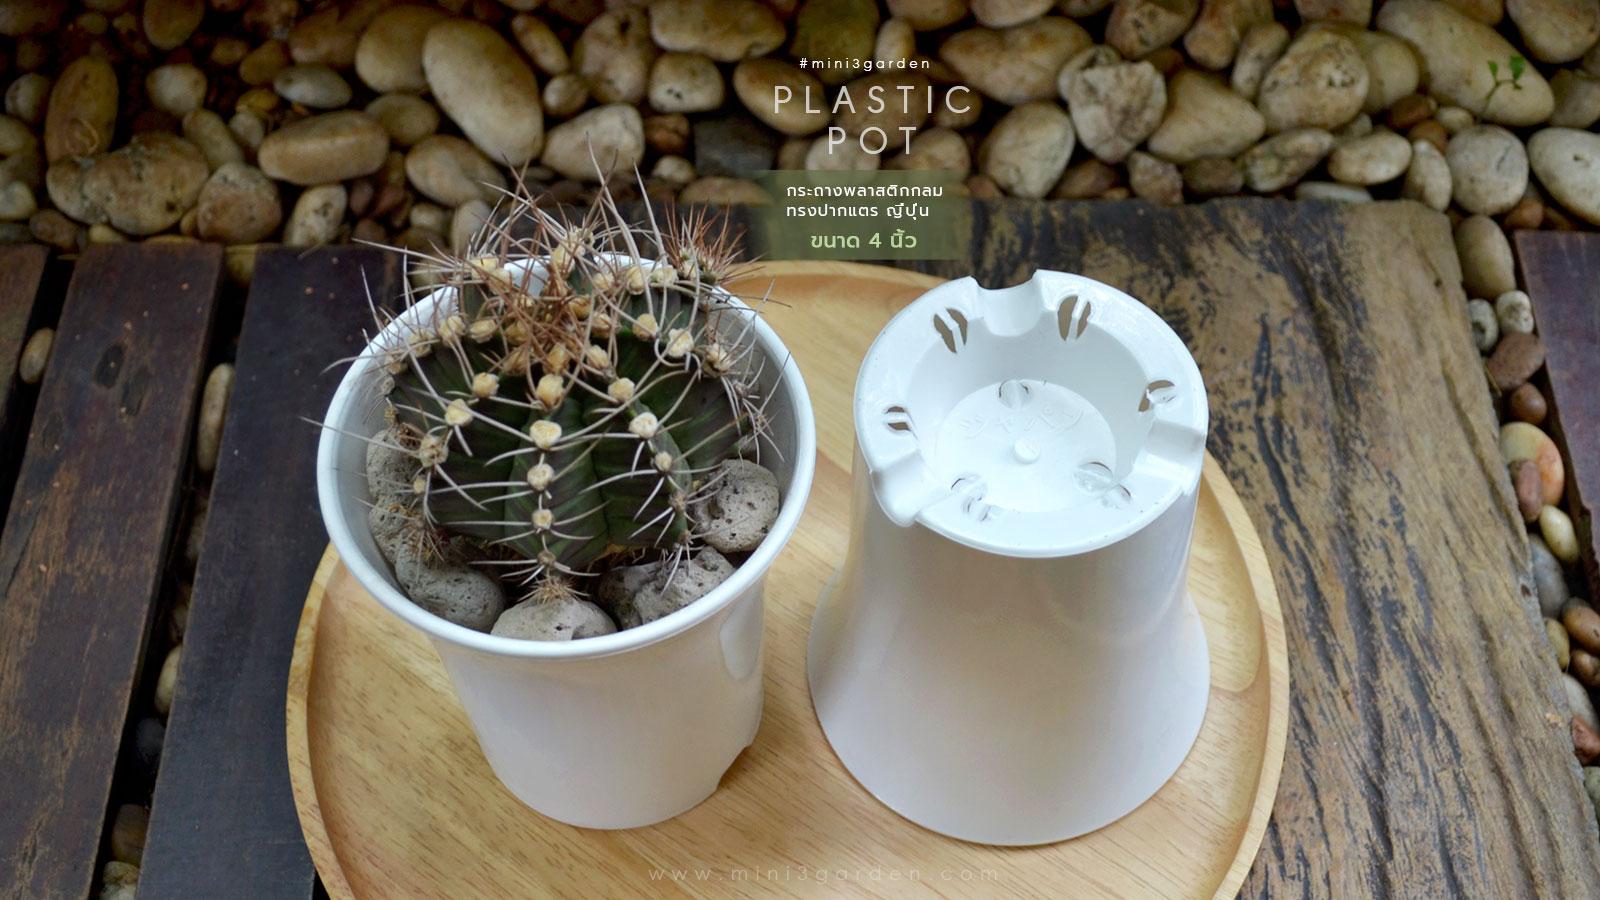 cactus-plastic-pot-japan-style-4inc-3.jpg